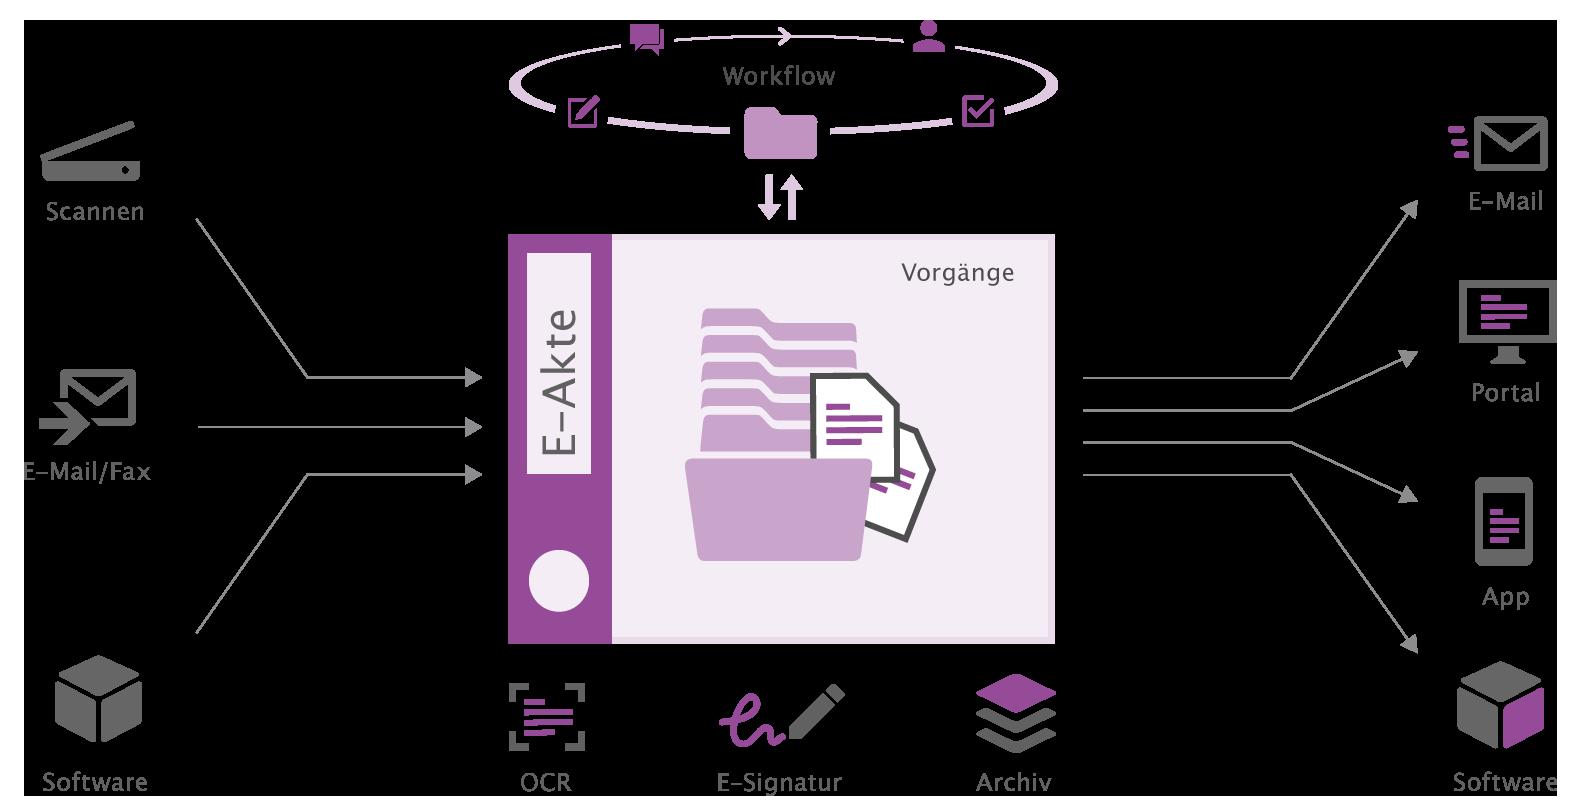 Digitale Akte otris dossier - IP-Akte, Prozessakte, Projektakte, HR-Akte mit otris dossier